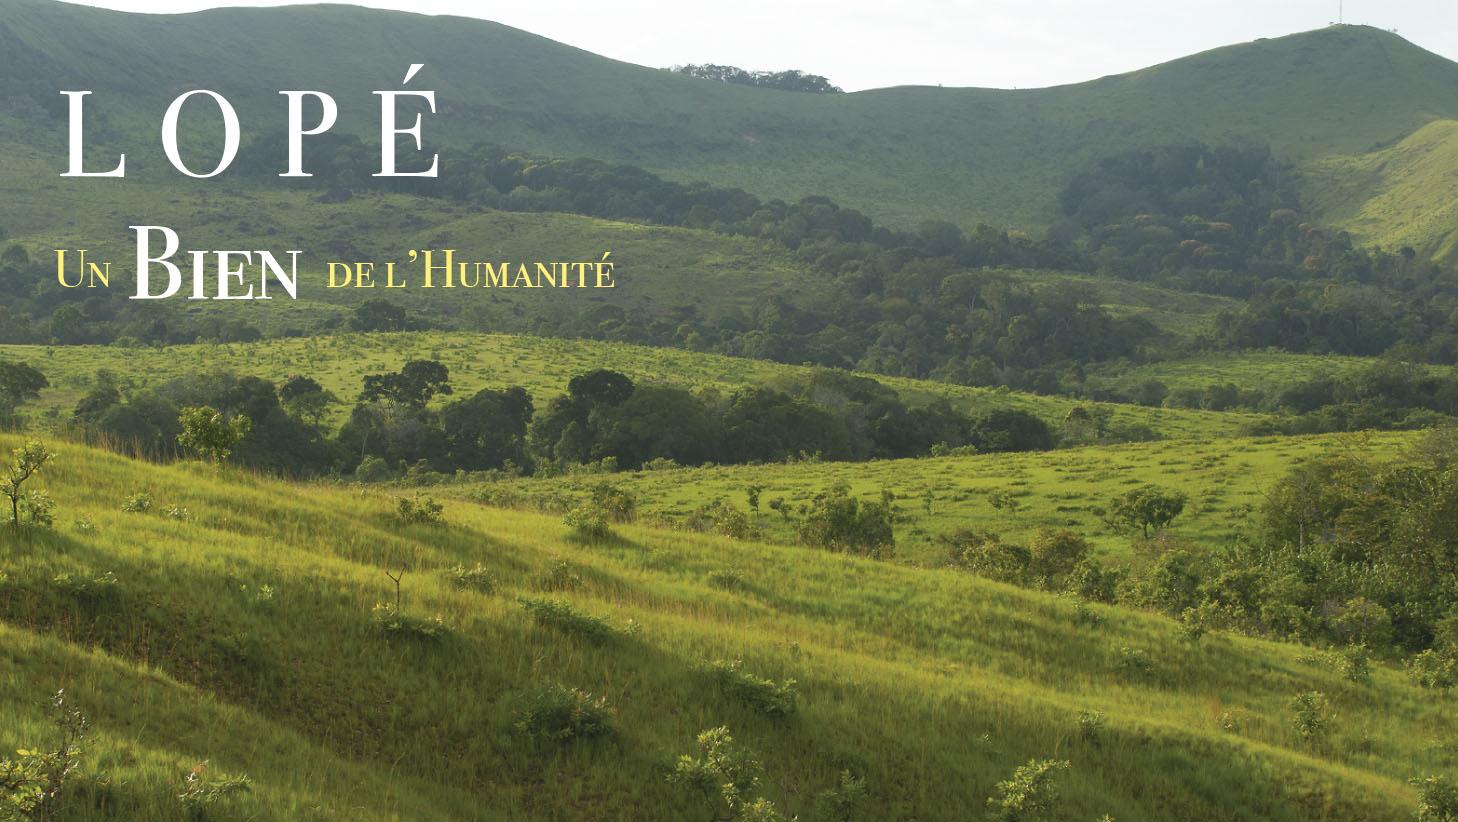 Lope_site